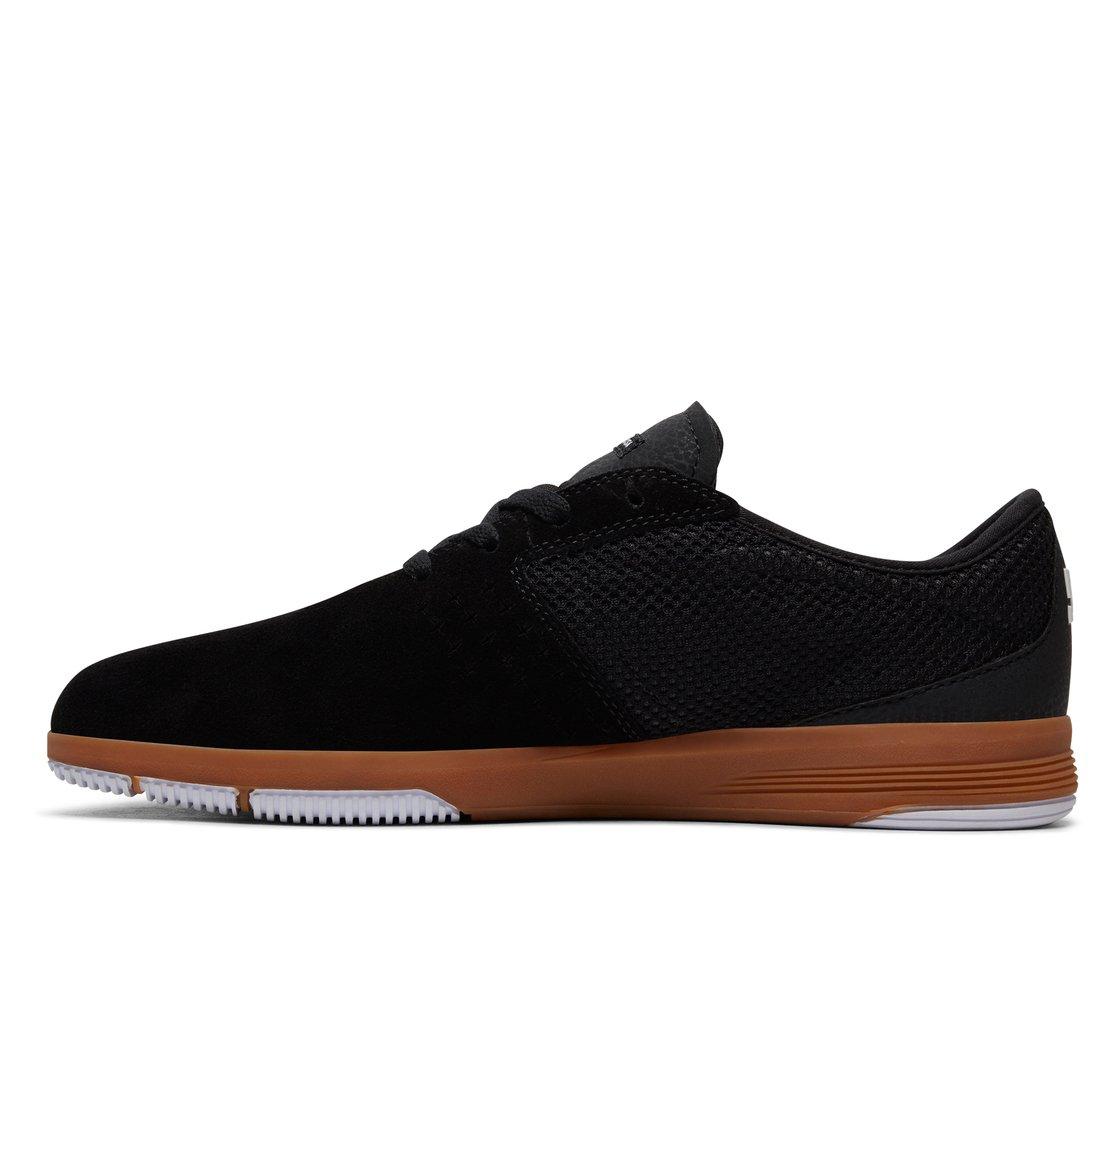 Acquista scarpe s  dfc9299712b